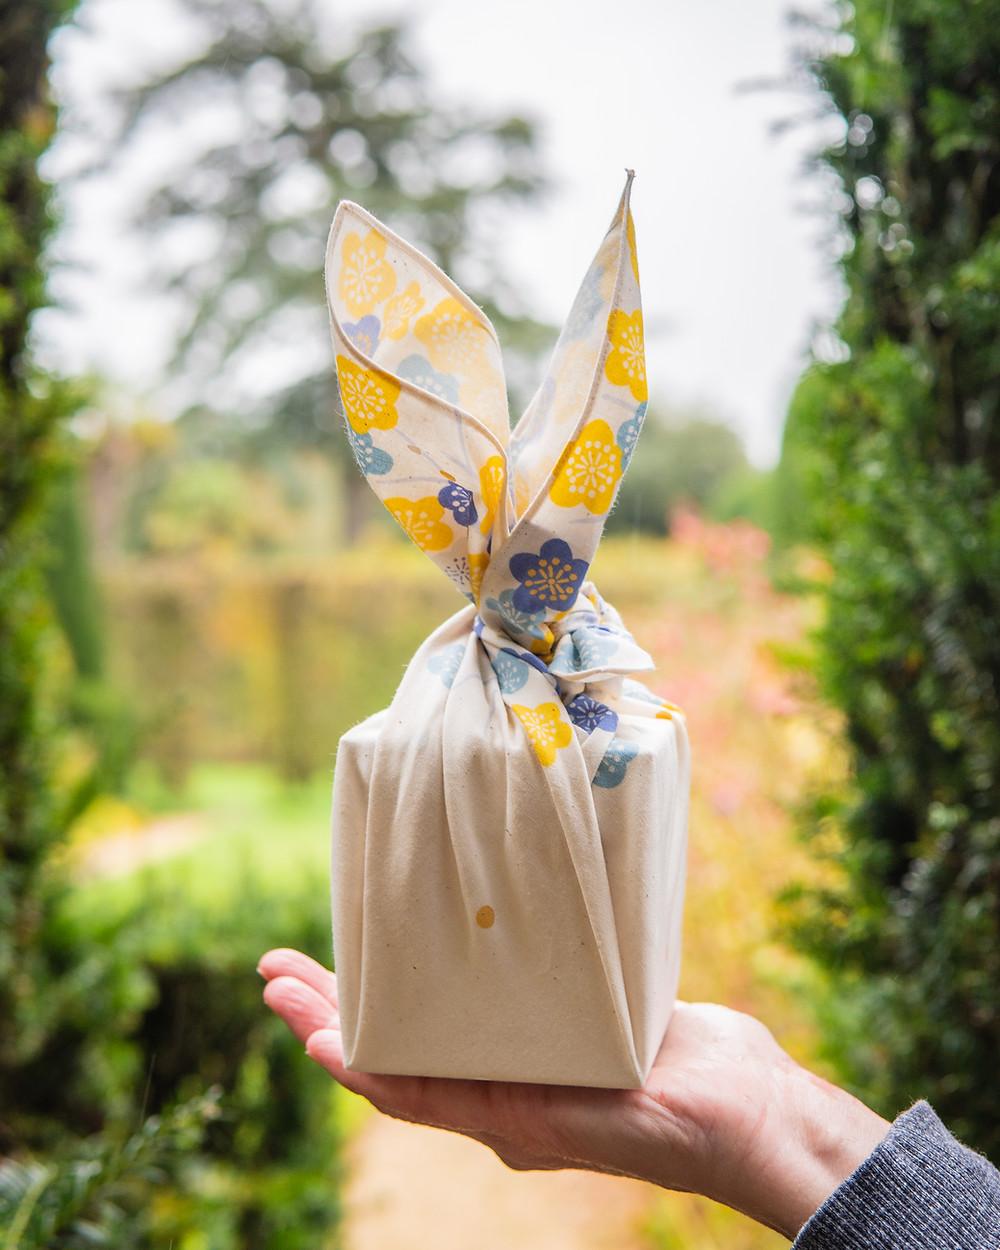 Zusetsu store furoshiki gift wrap fabric wrap Japanese wrapping